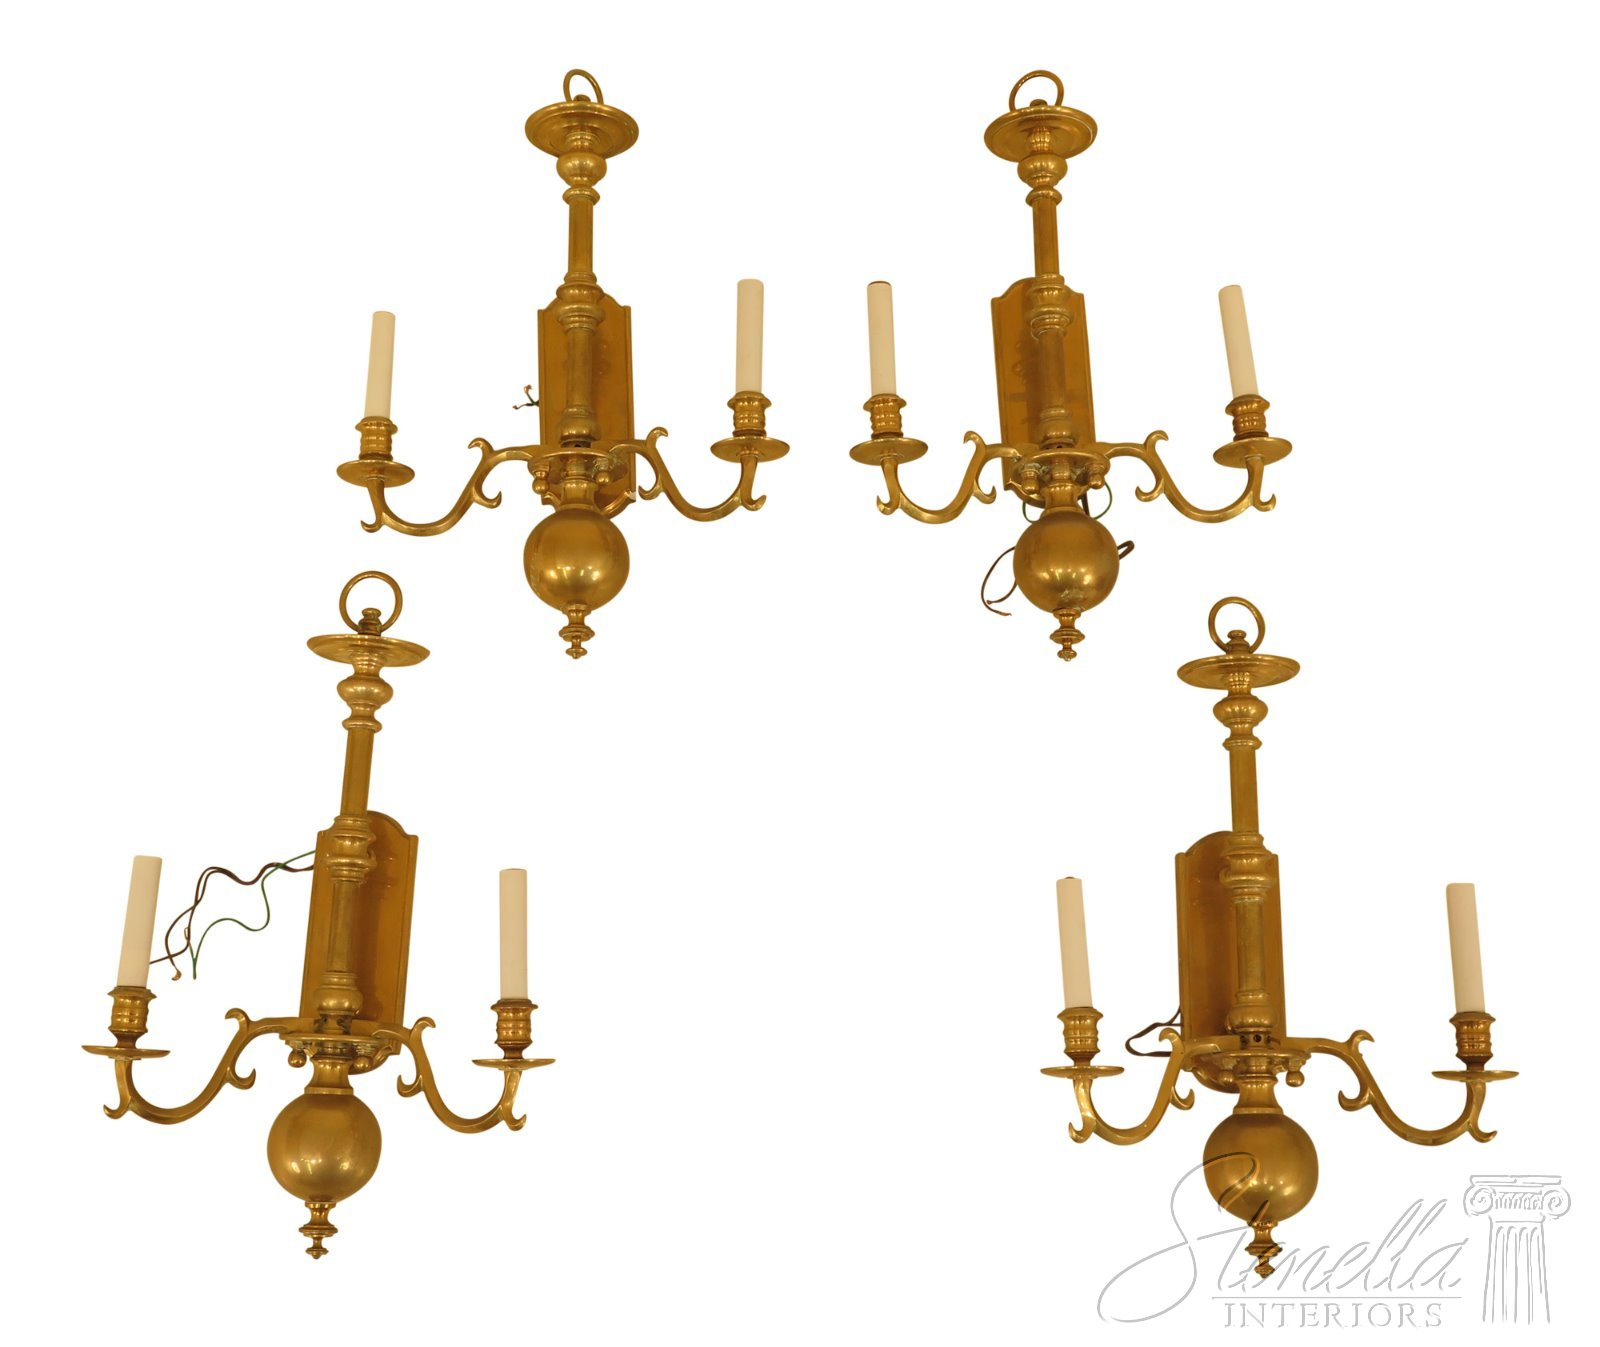 newest collection d1c44 9d145 Details about F30492EC/93EC: Set Of 4 Vintage Colonial Style Electrified  Brass Wall Sconces